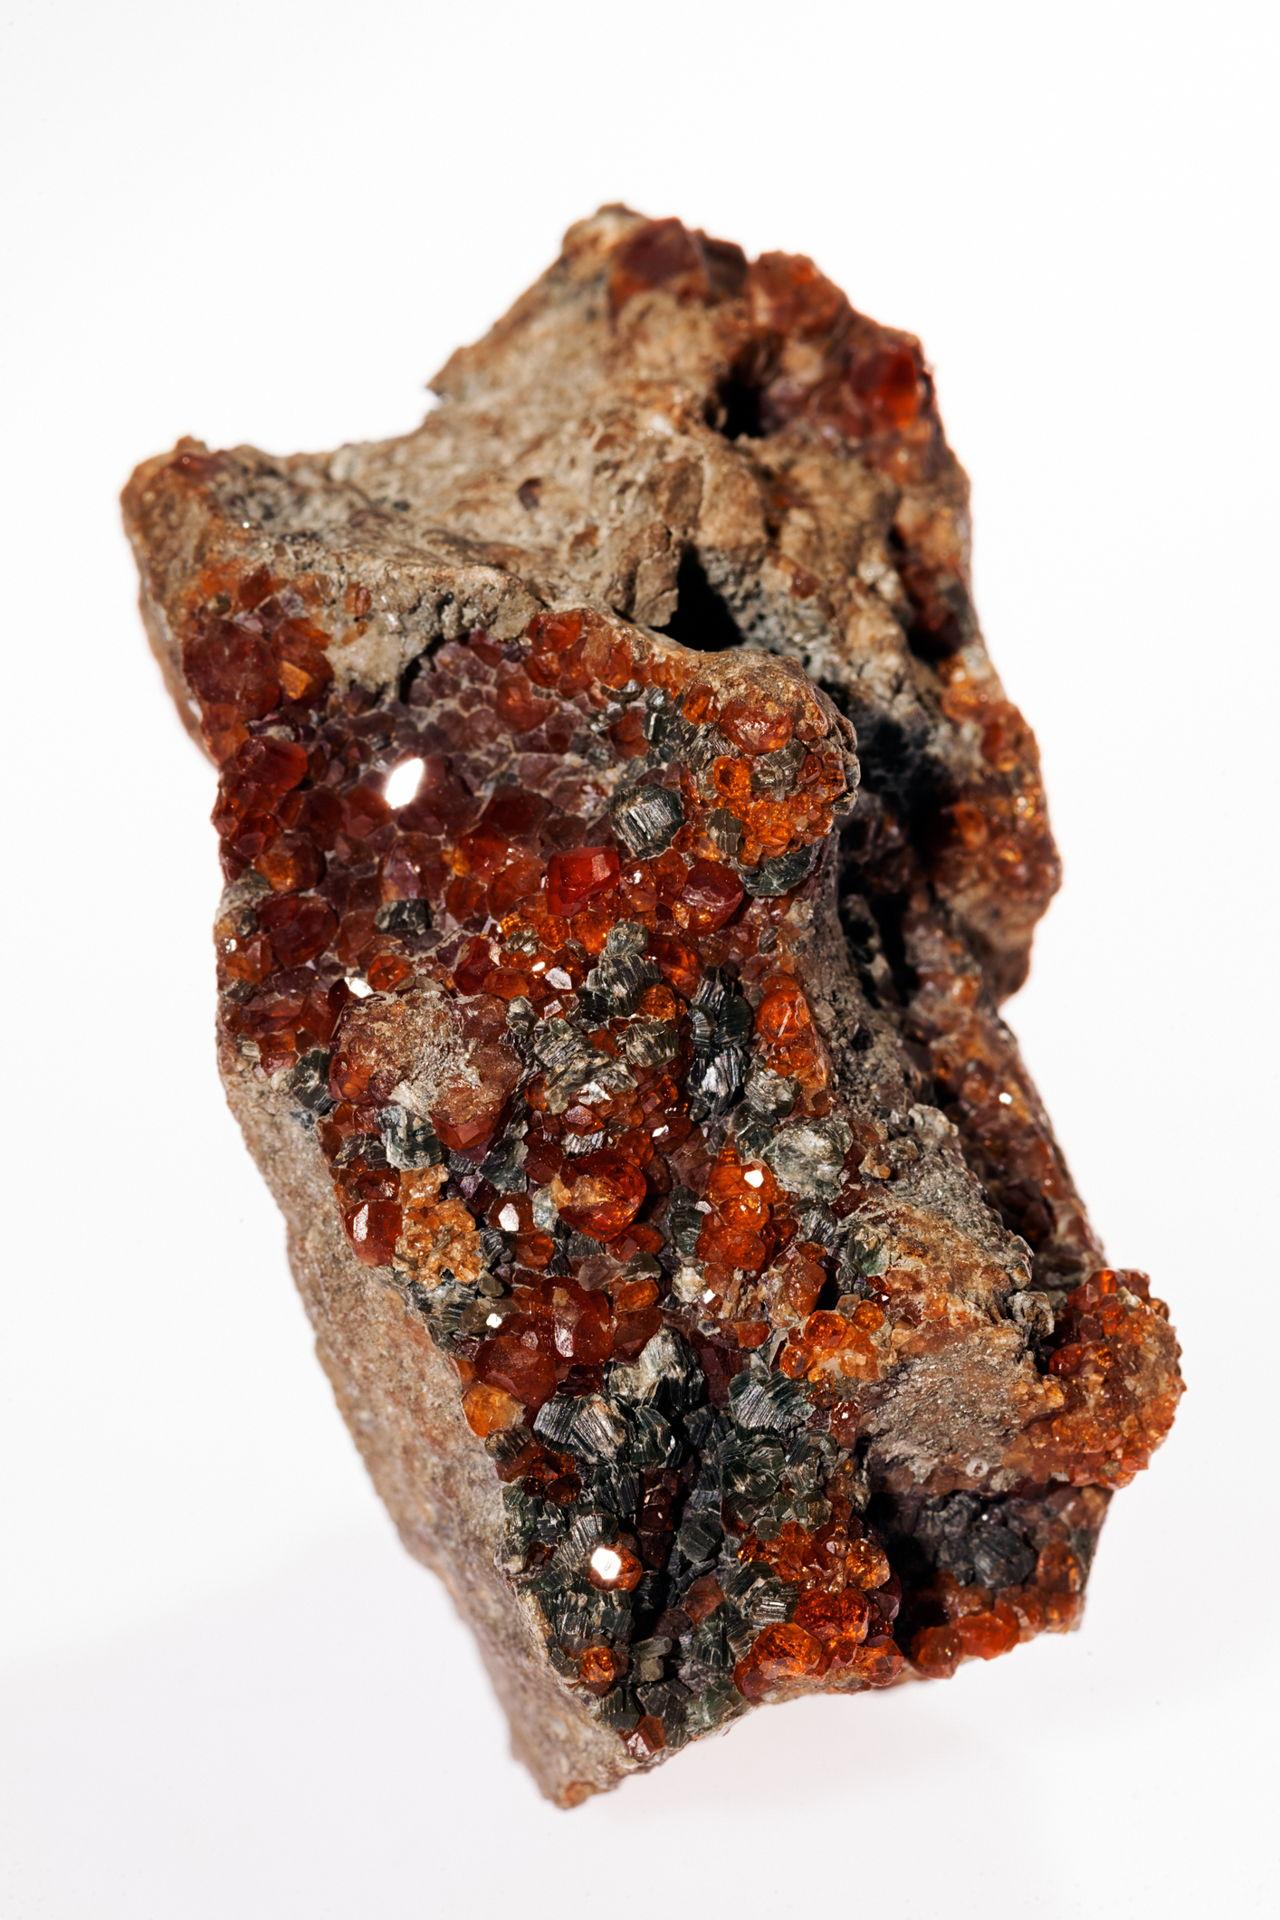 Chromite-Chromite-Mineral Photos-Mineral Encyclopedia ...  |Chromate Mineral